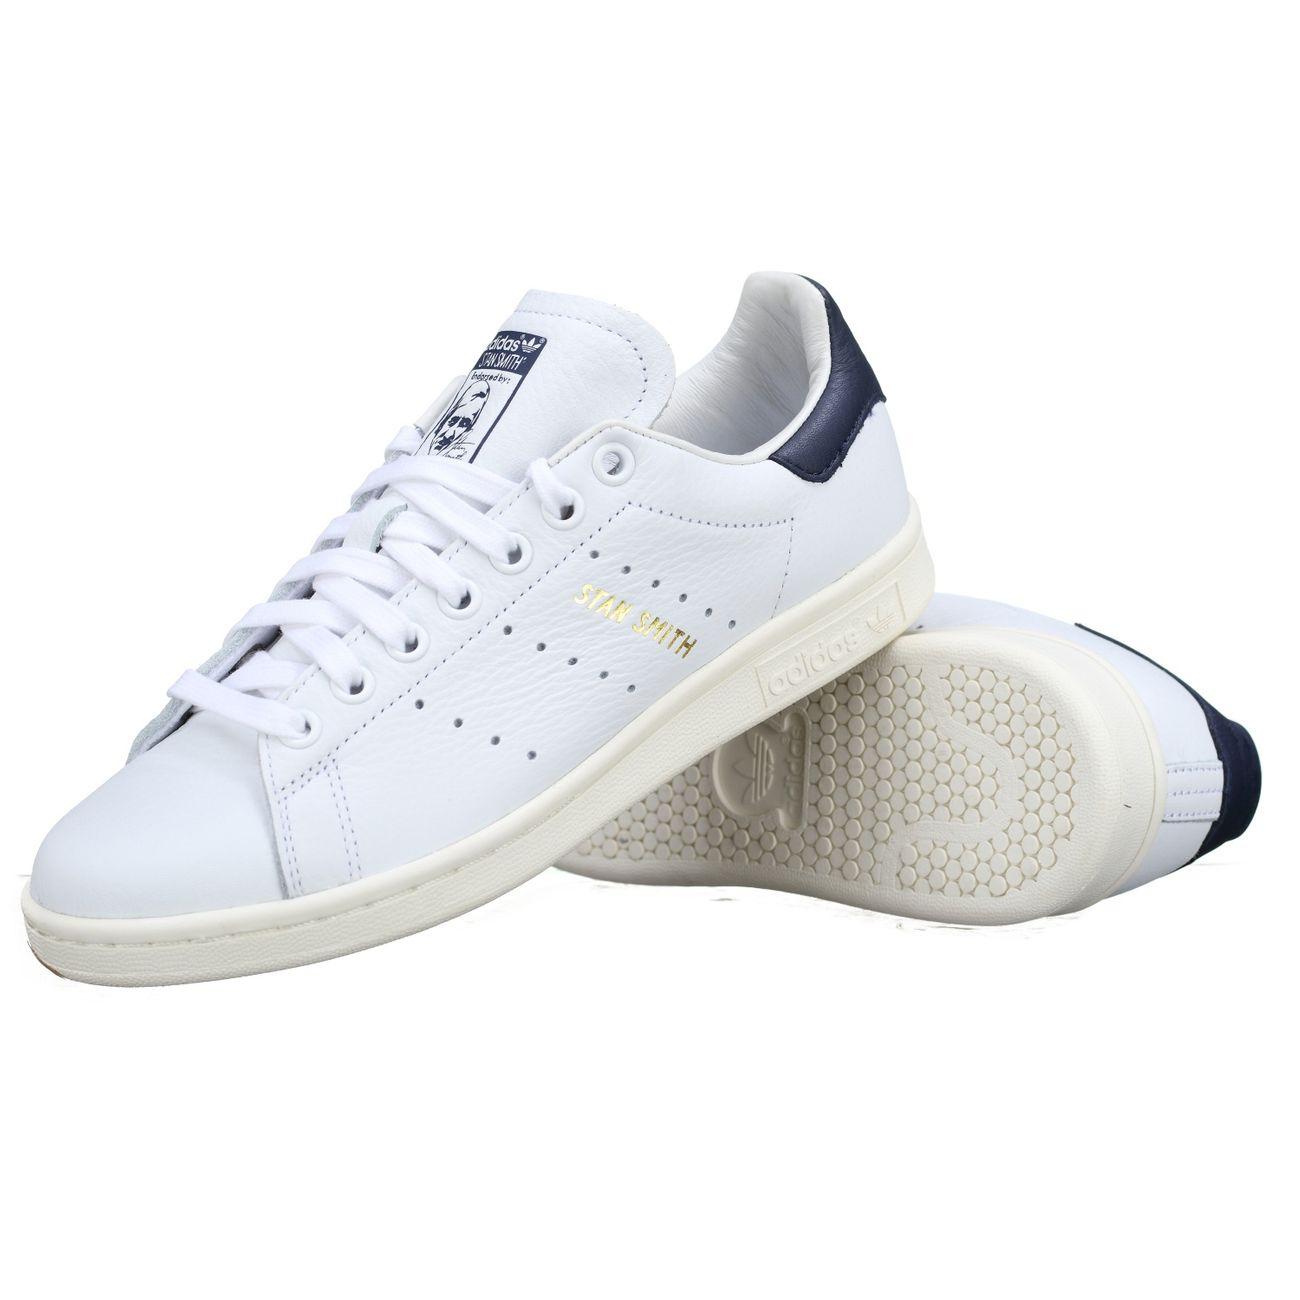 Sportives Cassé Homme Adidas Calpierre Chaussures Blanc Wx5if kiXZuP